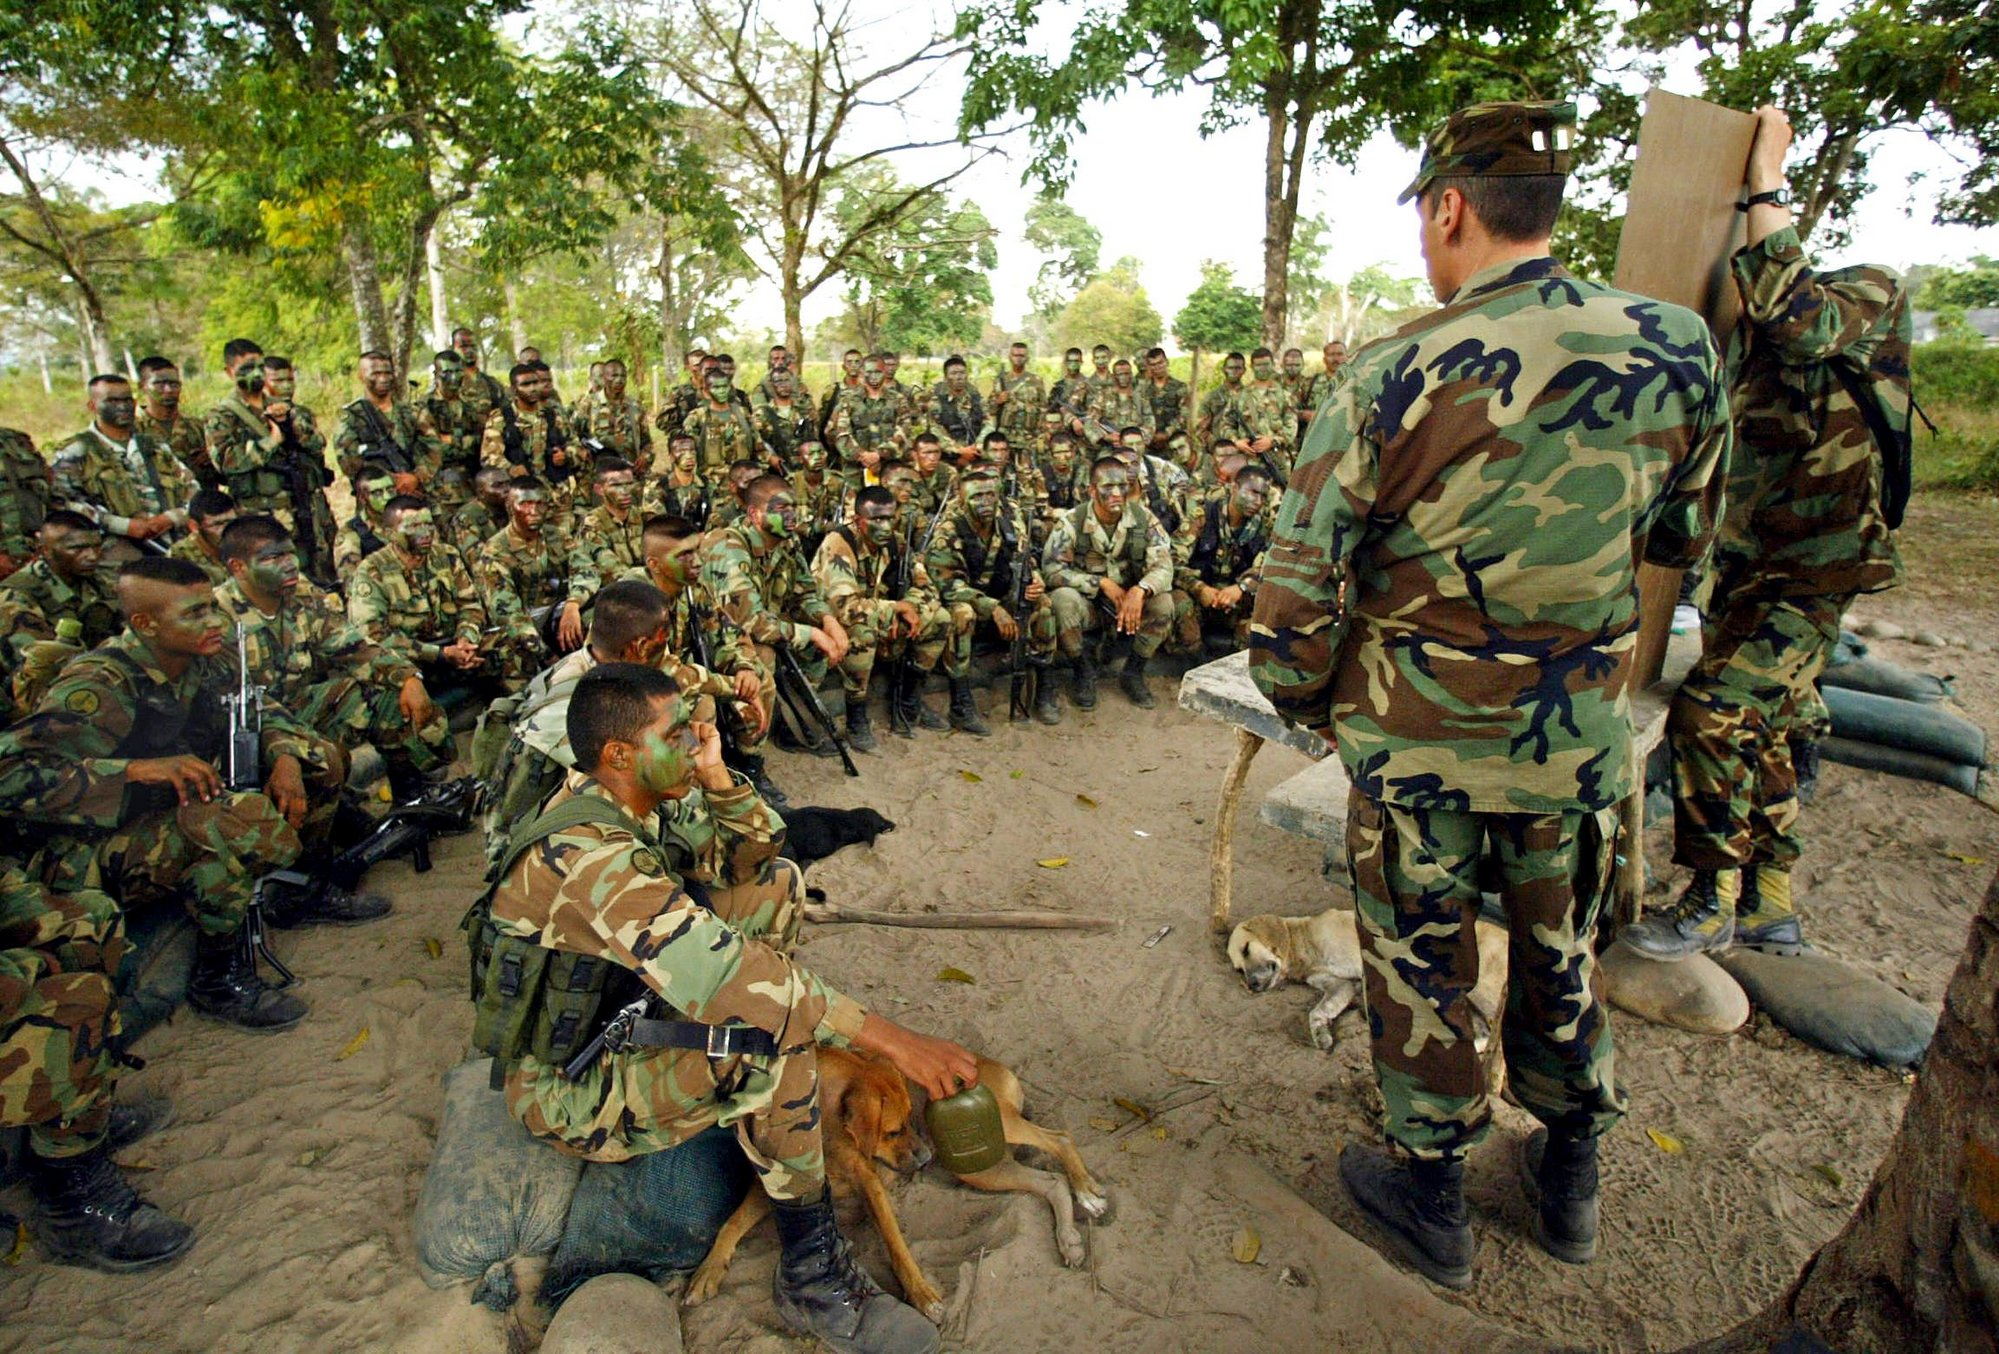 Un político ayudó a las FARC a secuestrar a once diputados que después asesinaron